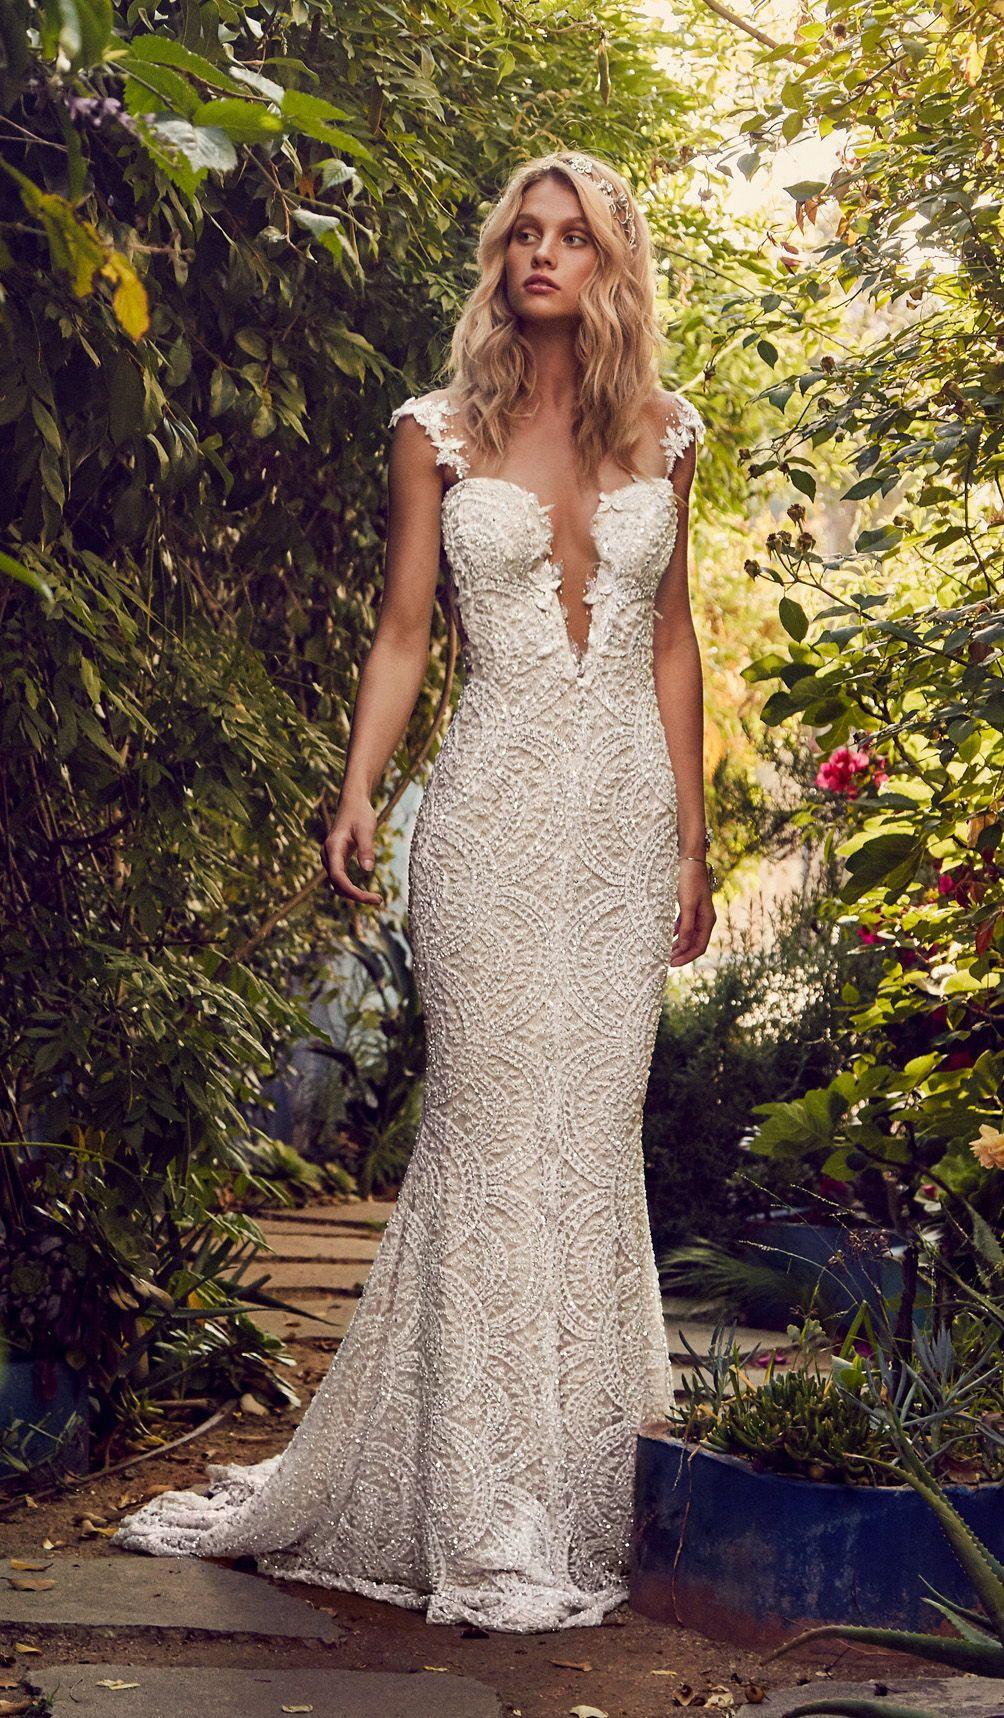 Harlow Queen Of Hearts Bridal Dresses Galia Lahav Summer Wedding Dress Ball Gown Wedding Dress Wedding Dresses Simple [ 1718 x 1004 Pixel ]